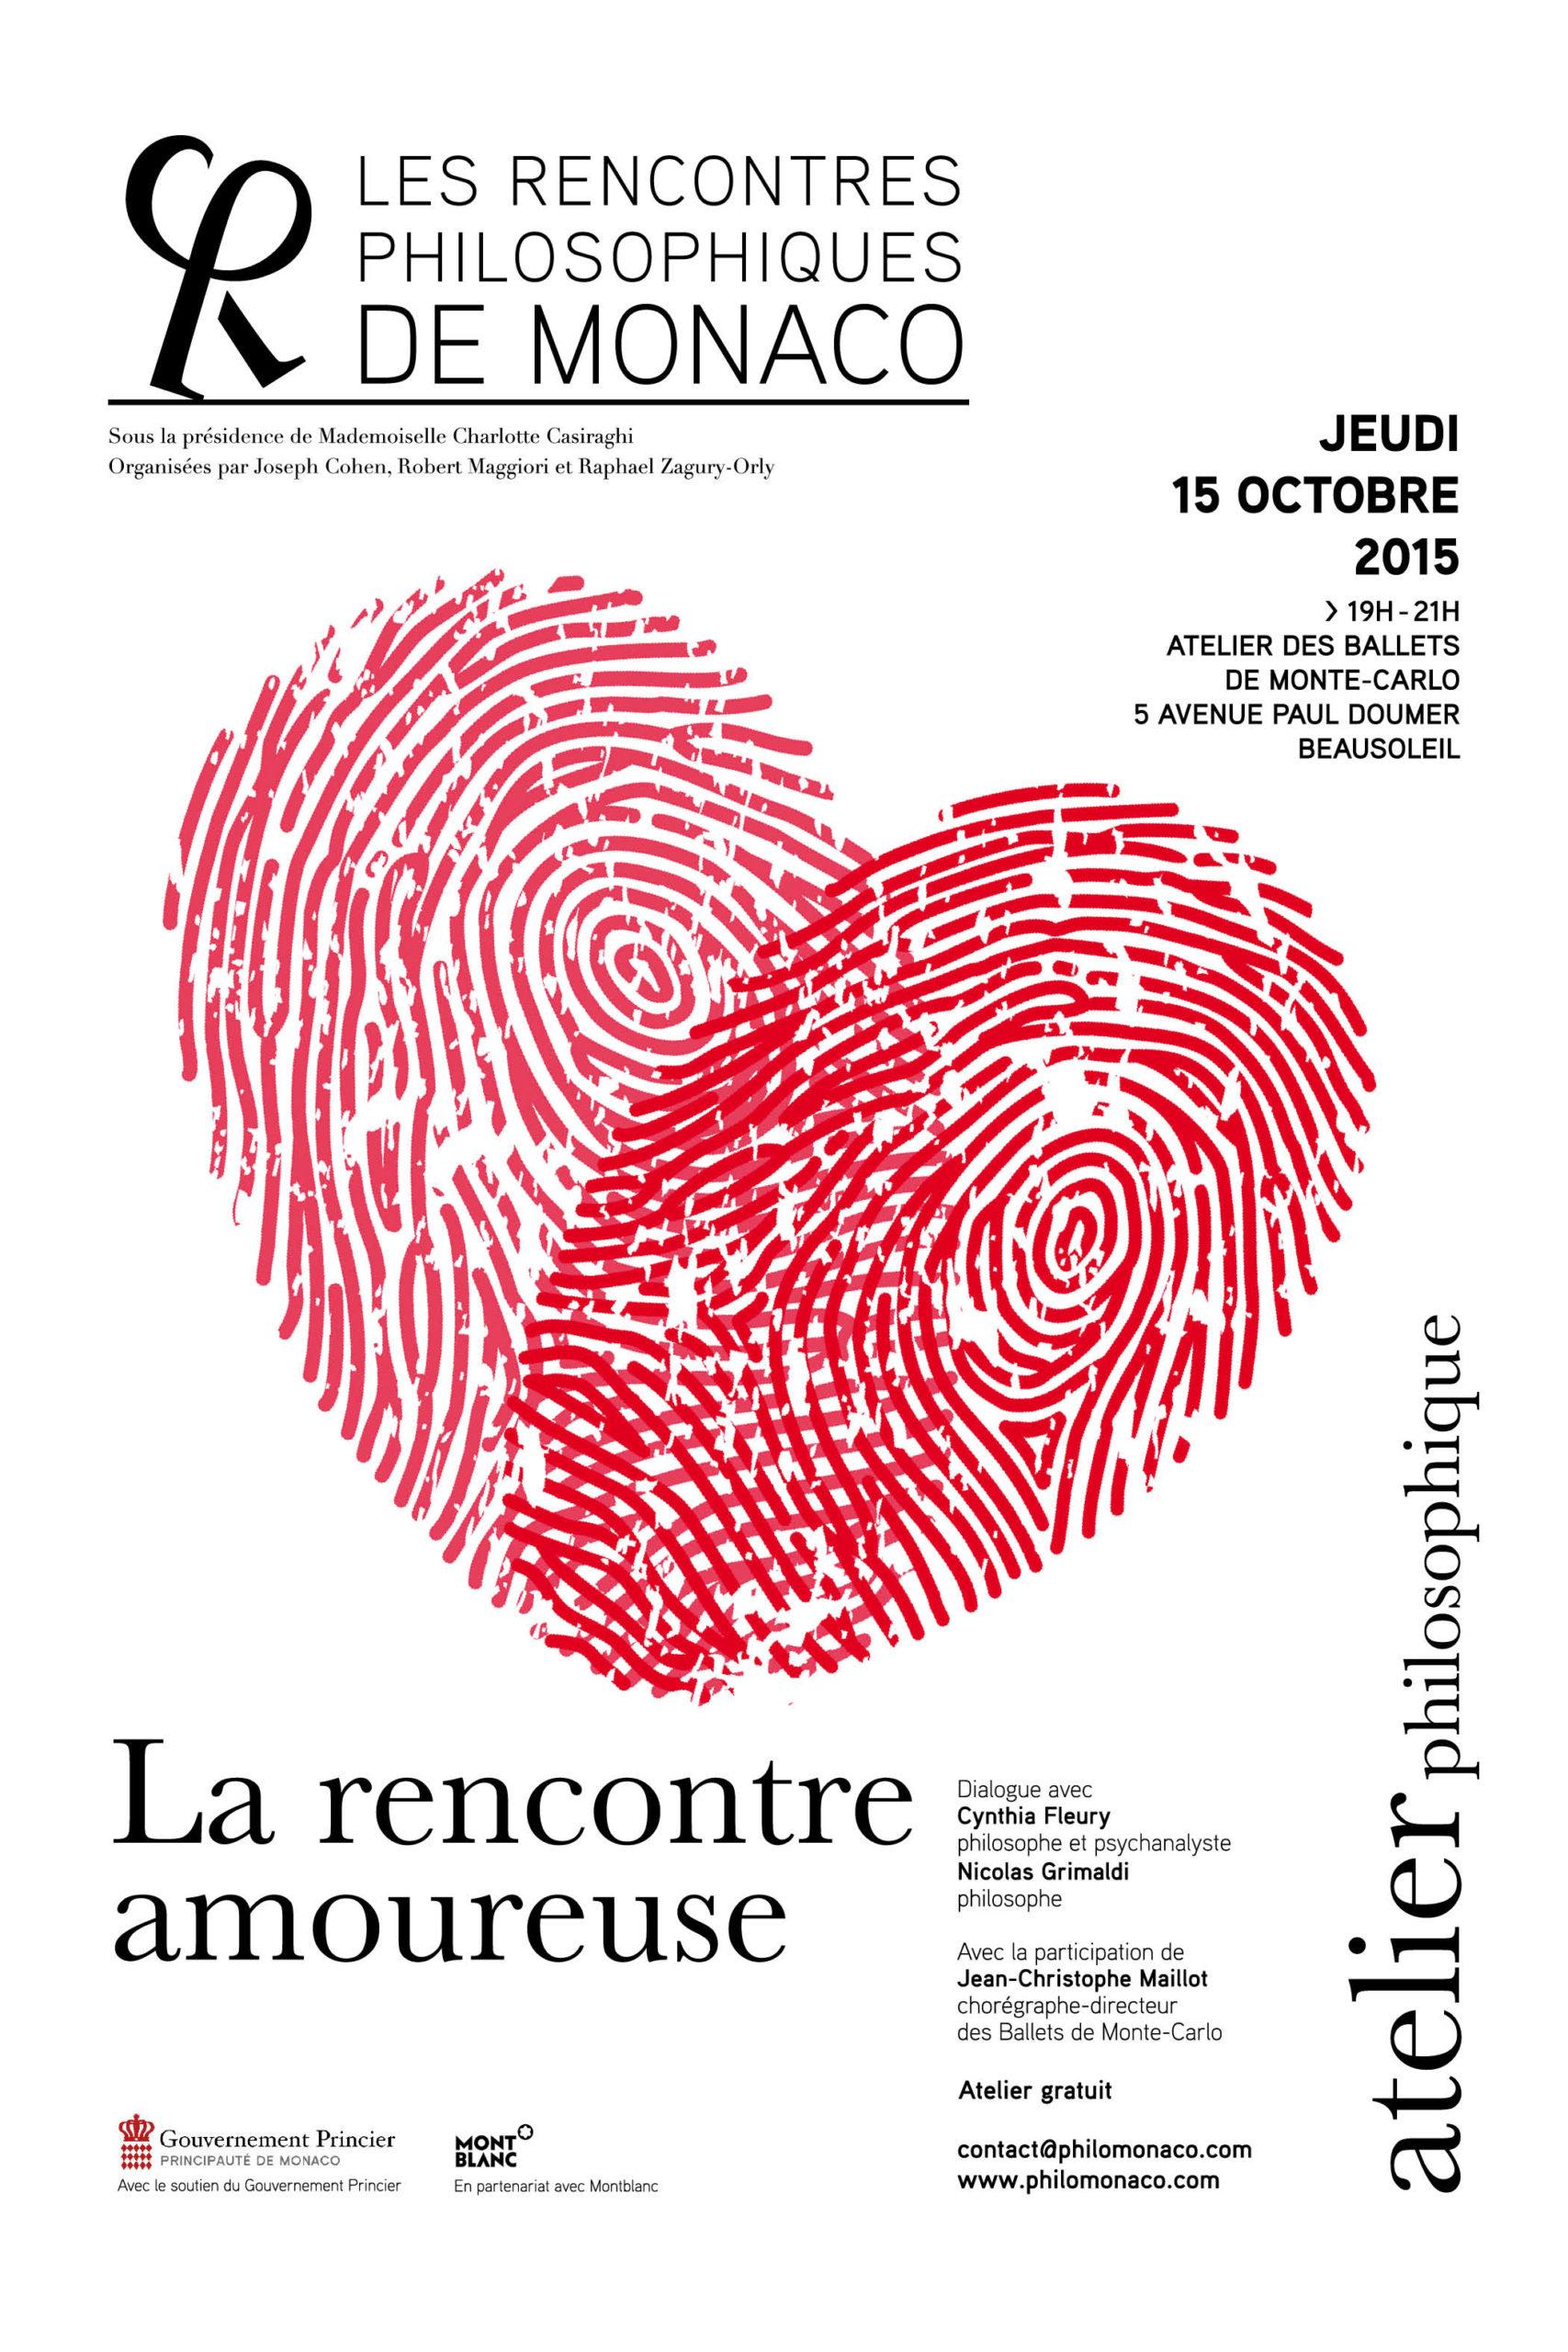 1113, 1113, La rencontre amoureuse - 15 oct 2015 -, La-rencontre-amoureuse-15-oct-2015--scaled.jpg, 705391, https://philomonaco.com/wp-content/uploads/2017/02/La-rencontre-amoureuse-15-oct-2015--scaled.jpg, https://philomonaco.com/atelier/la-rencontre-amoureuse/la-rencontre-amoureuse-15-oct-2015/, , 2, , , la-rencontre-amoureuse-15-oct-2015, inherit, 1111, 2017-02-20 14:47:44, 2017-02-20 14:47:47, 0, image/jpeg, image, jpeg, https://philomonaco.com/wp-includes/images/media/default.png, 2100, 3150, Array